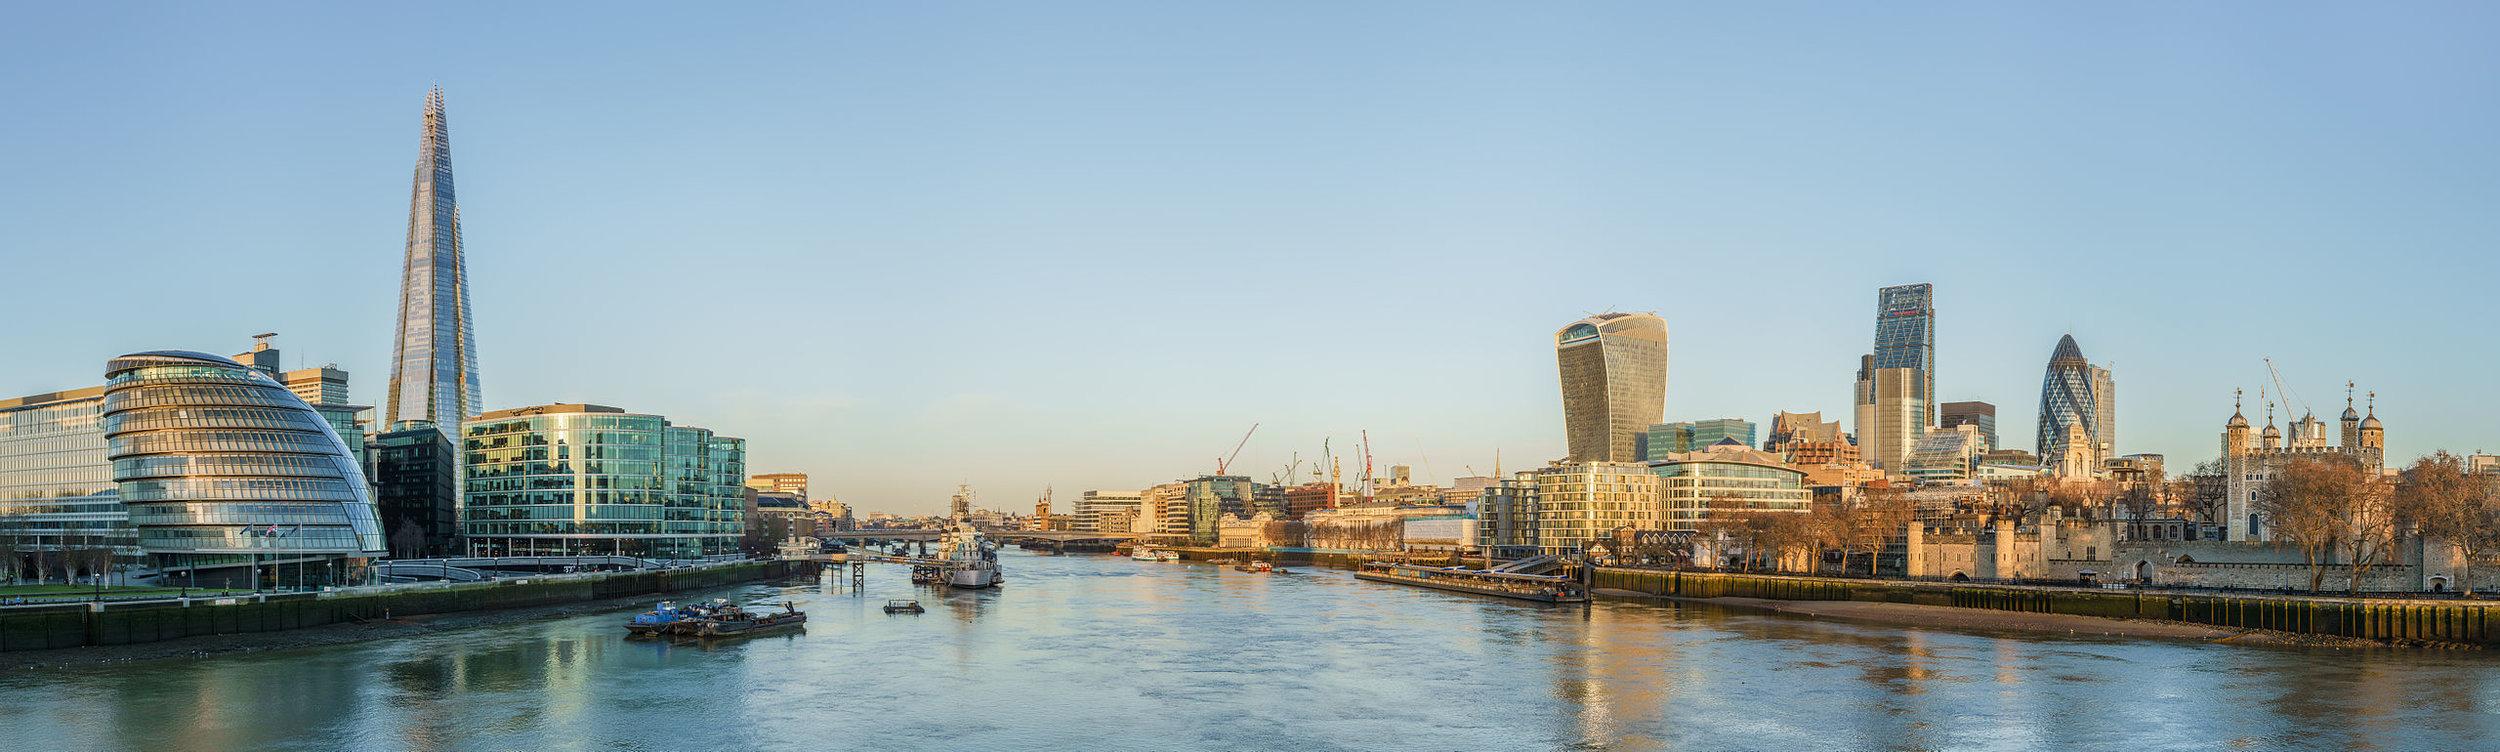 Tower_Bridge_view_at_dawn_crop.jpg